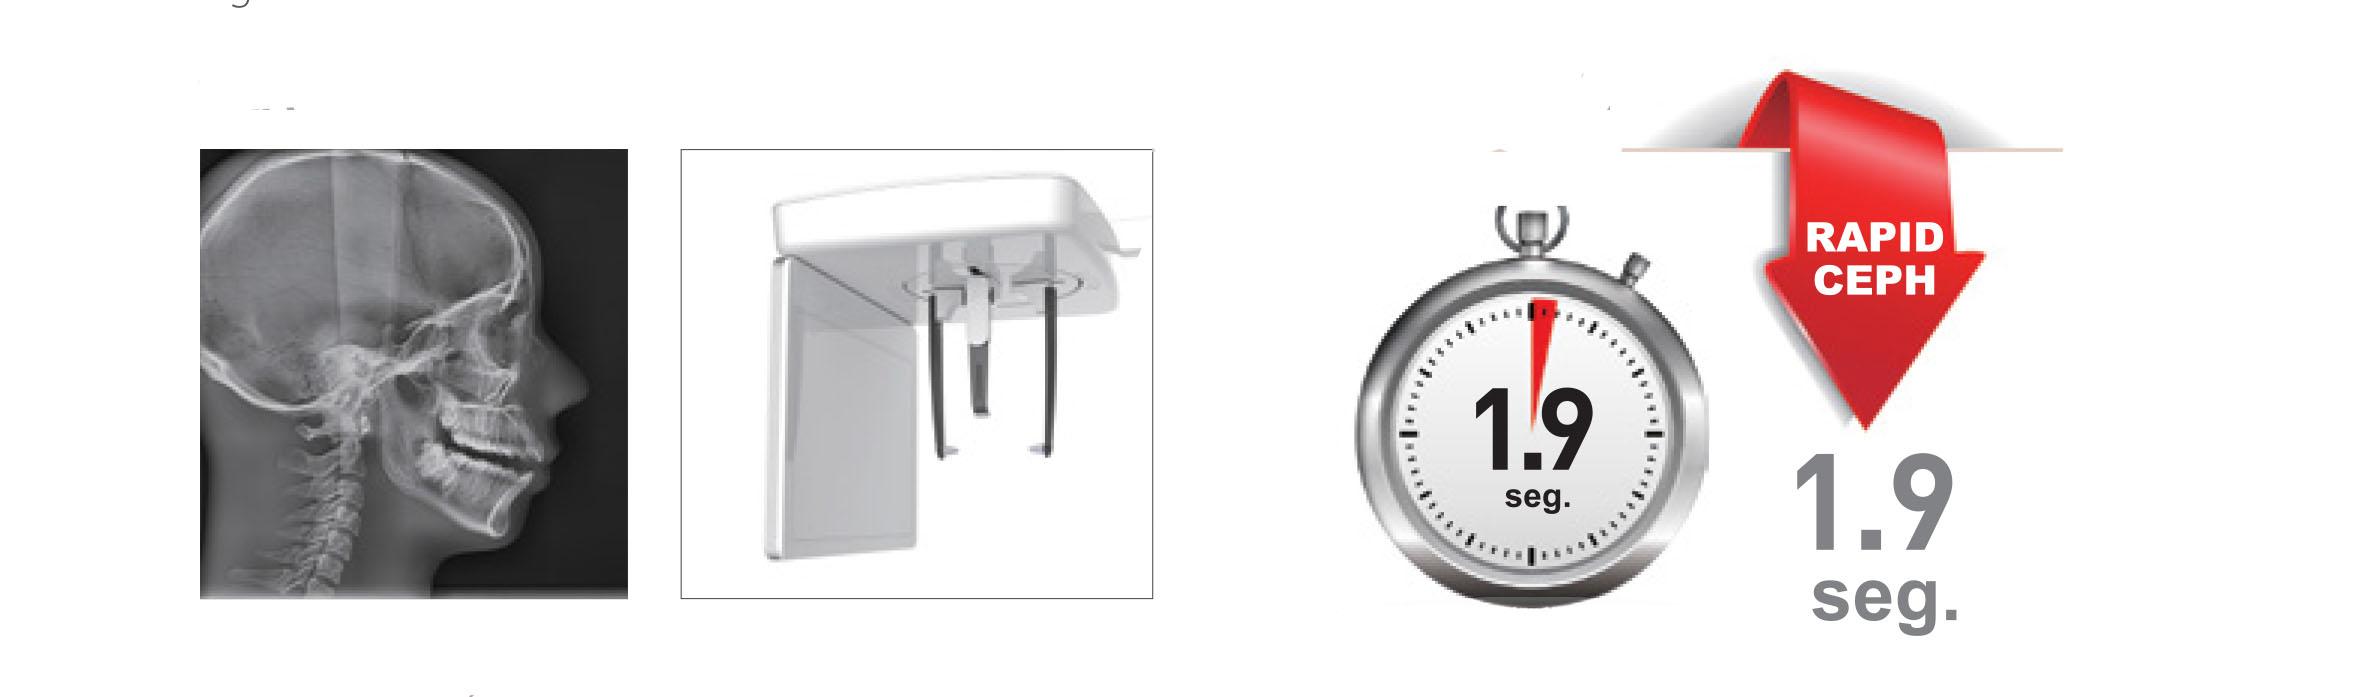 Rayos X dental precio panorámico Pax-i Plus Rapid Ceph